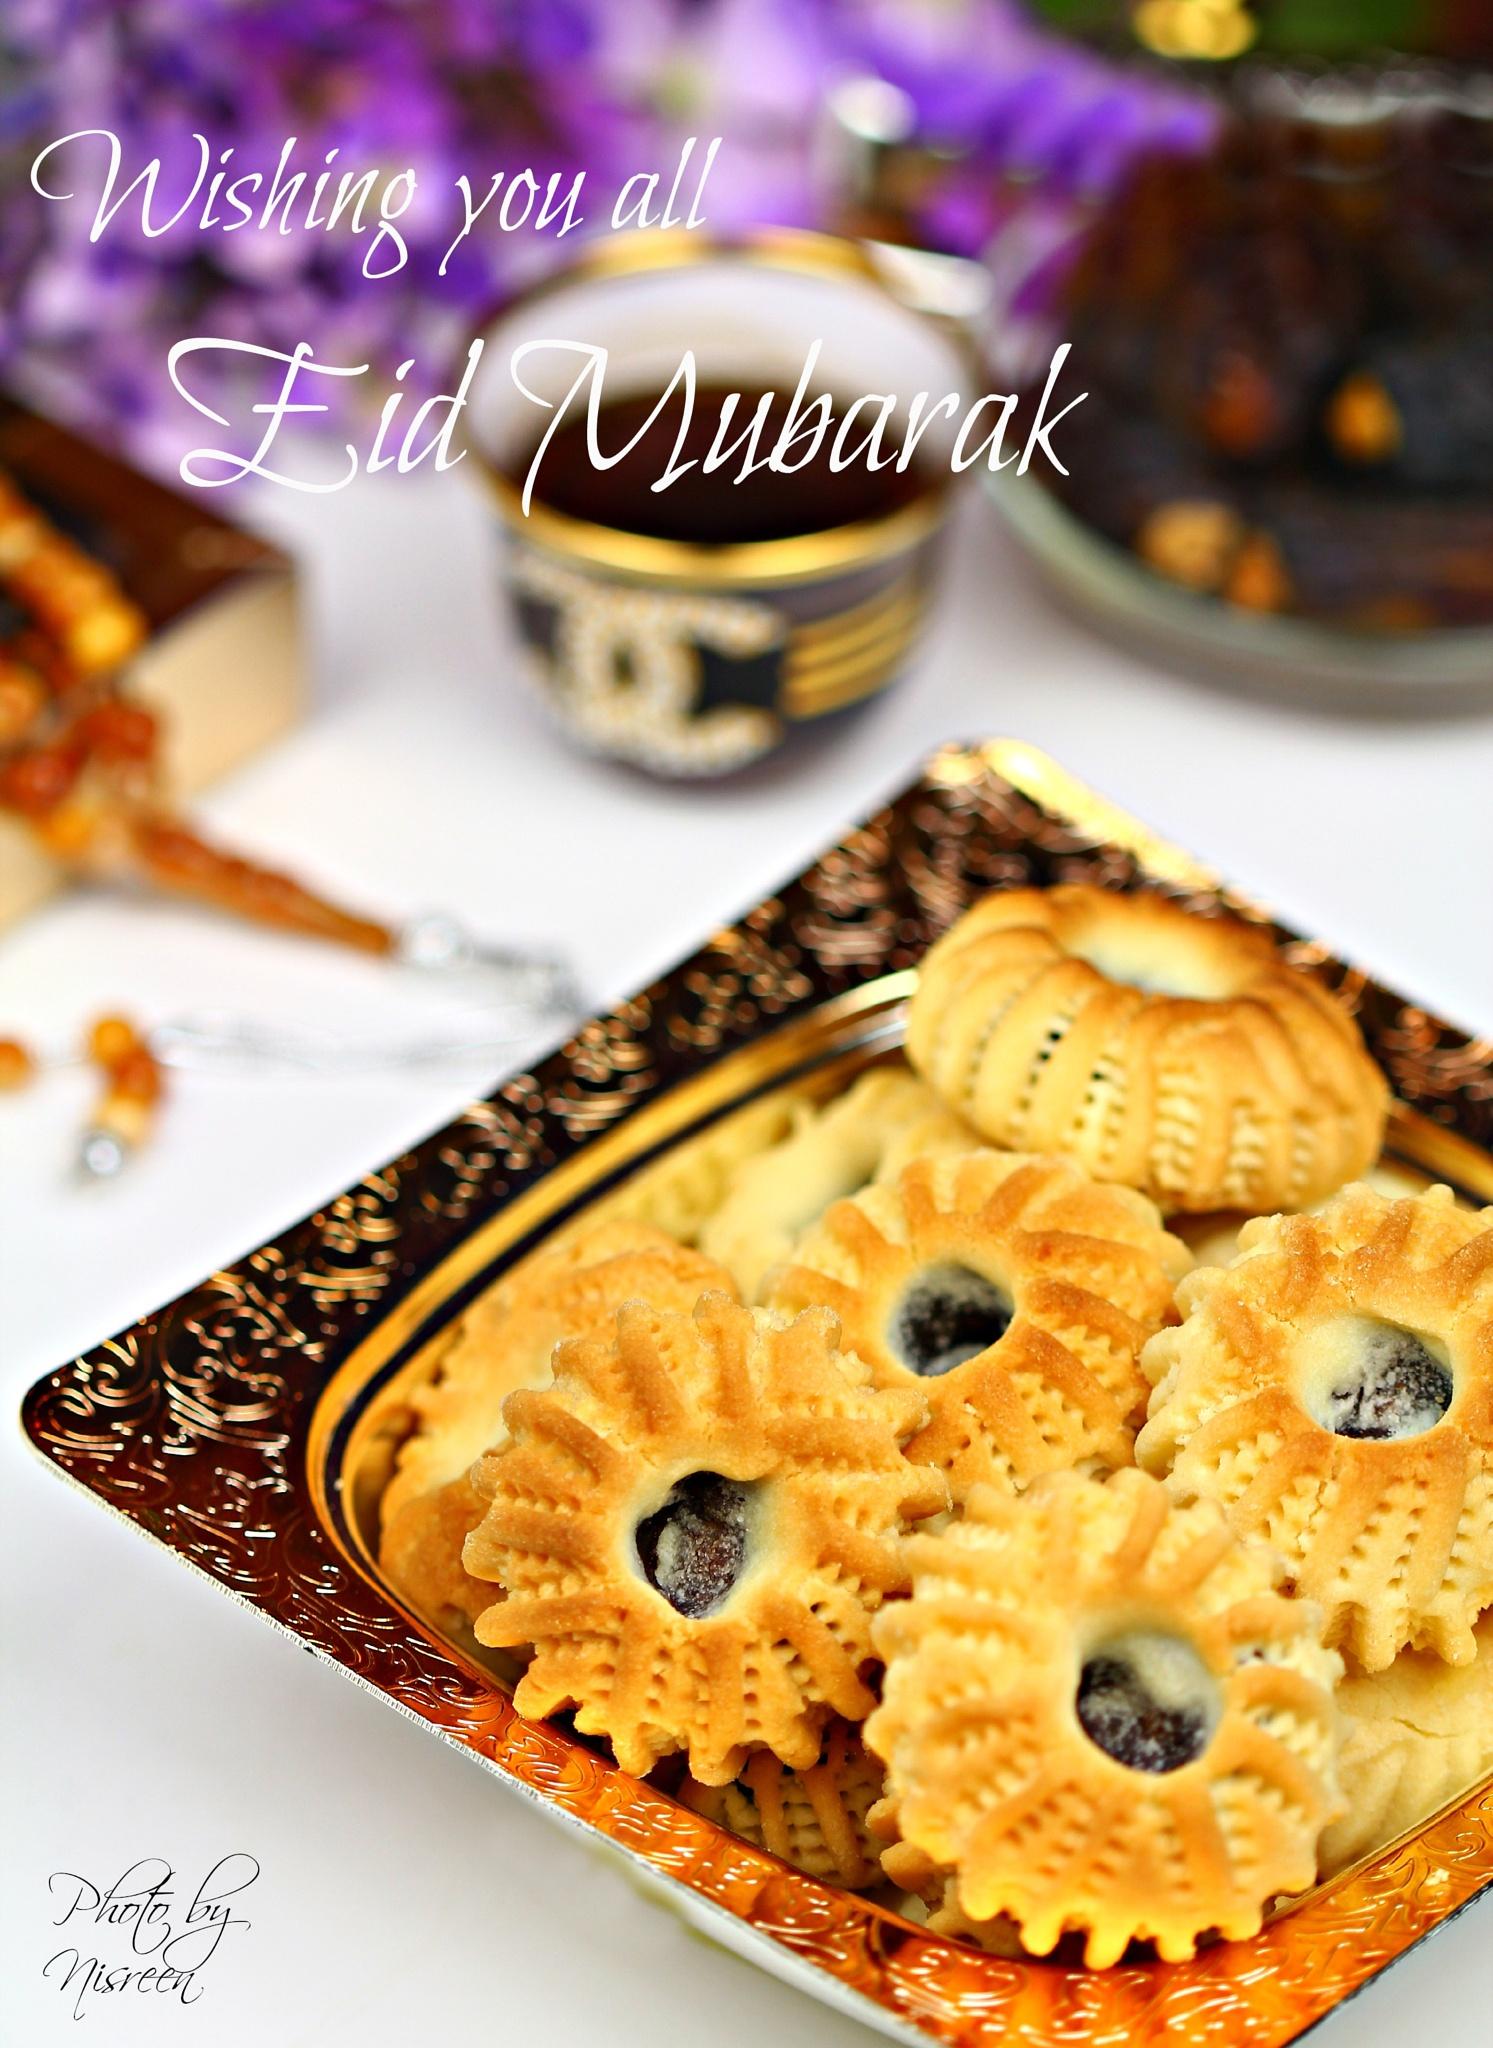 Mamool cookies by Nisreen Rahhal